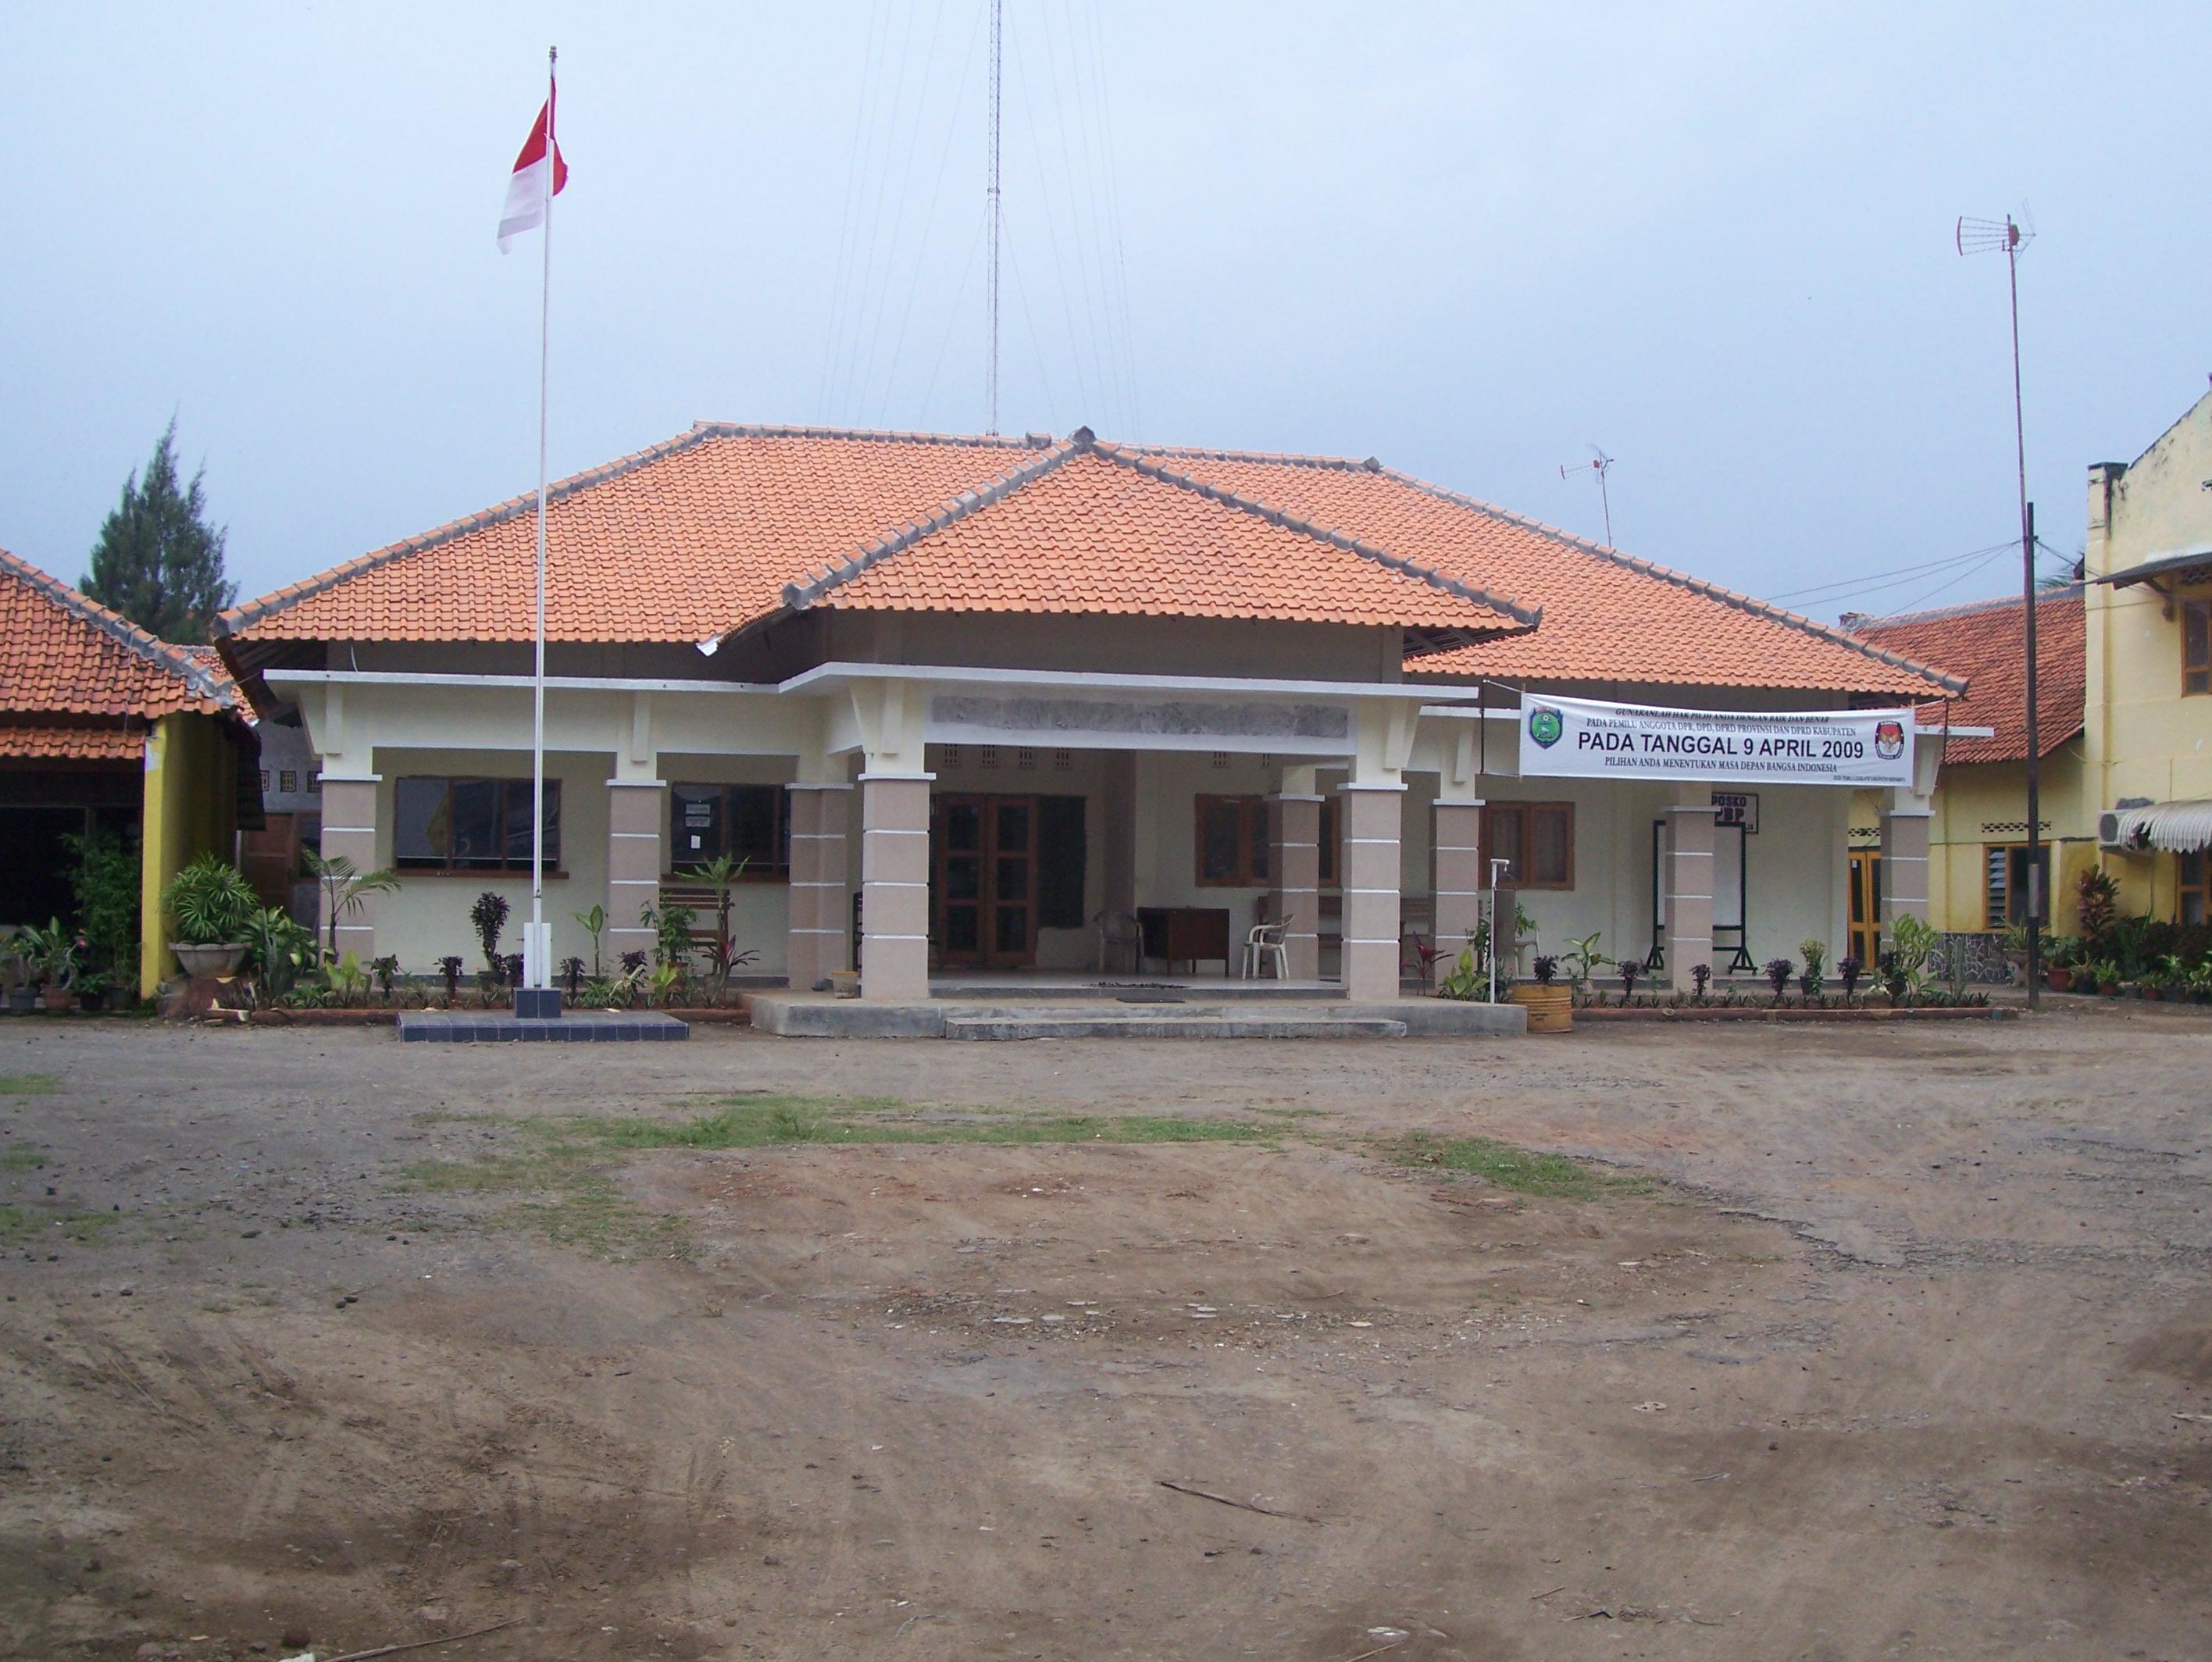 Berkas Kantor Camat Haurgeulis Jpg Wikipedia Bahasa Indonesia Ensiklopedia Bebas